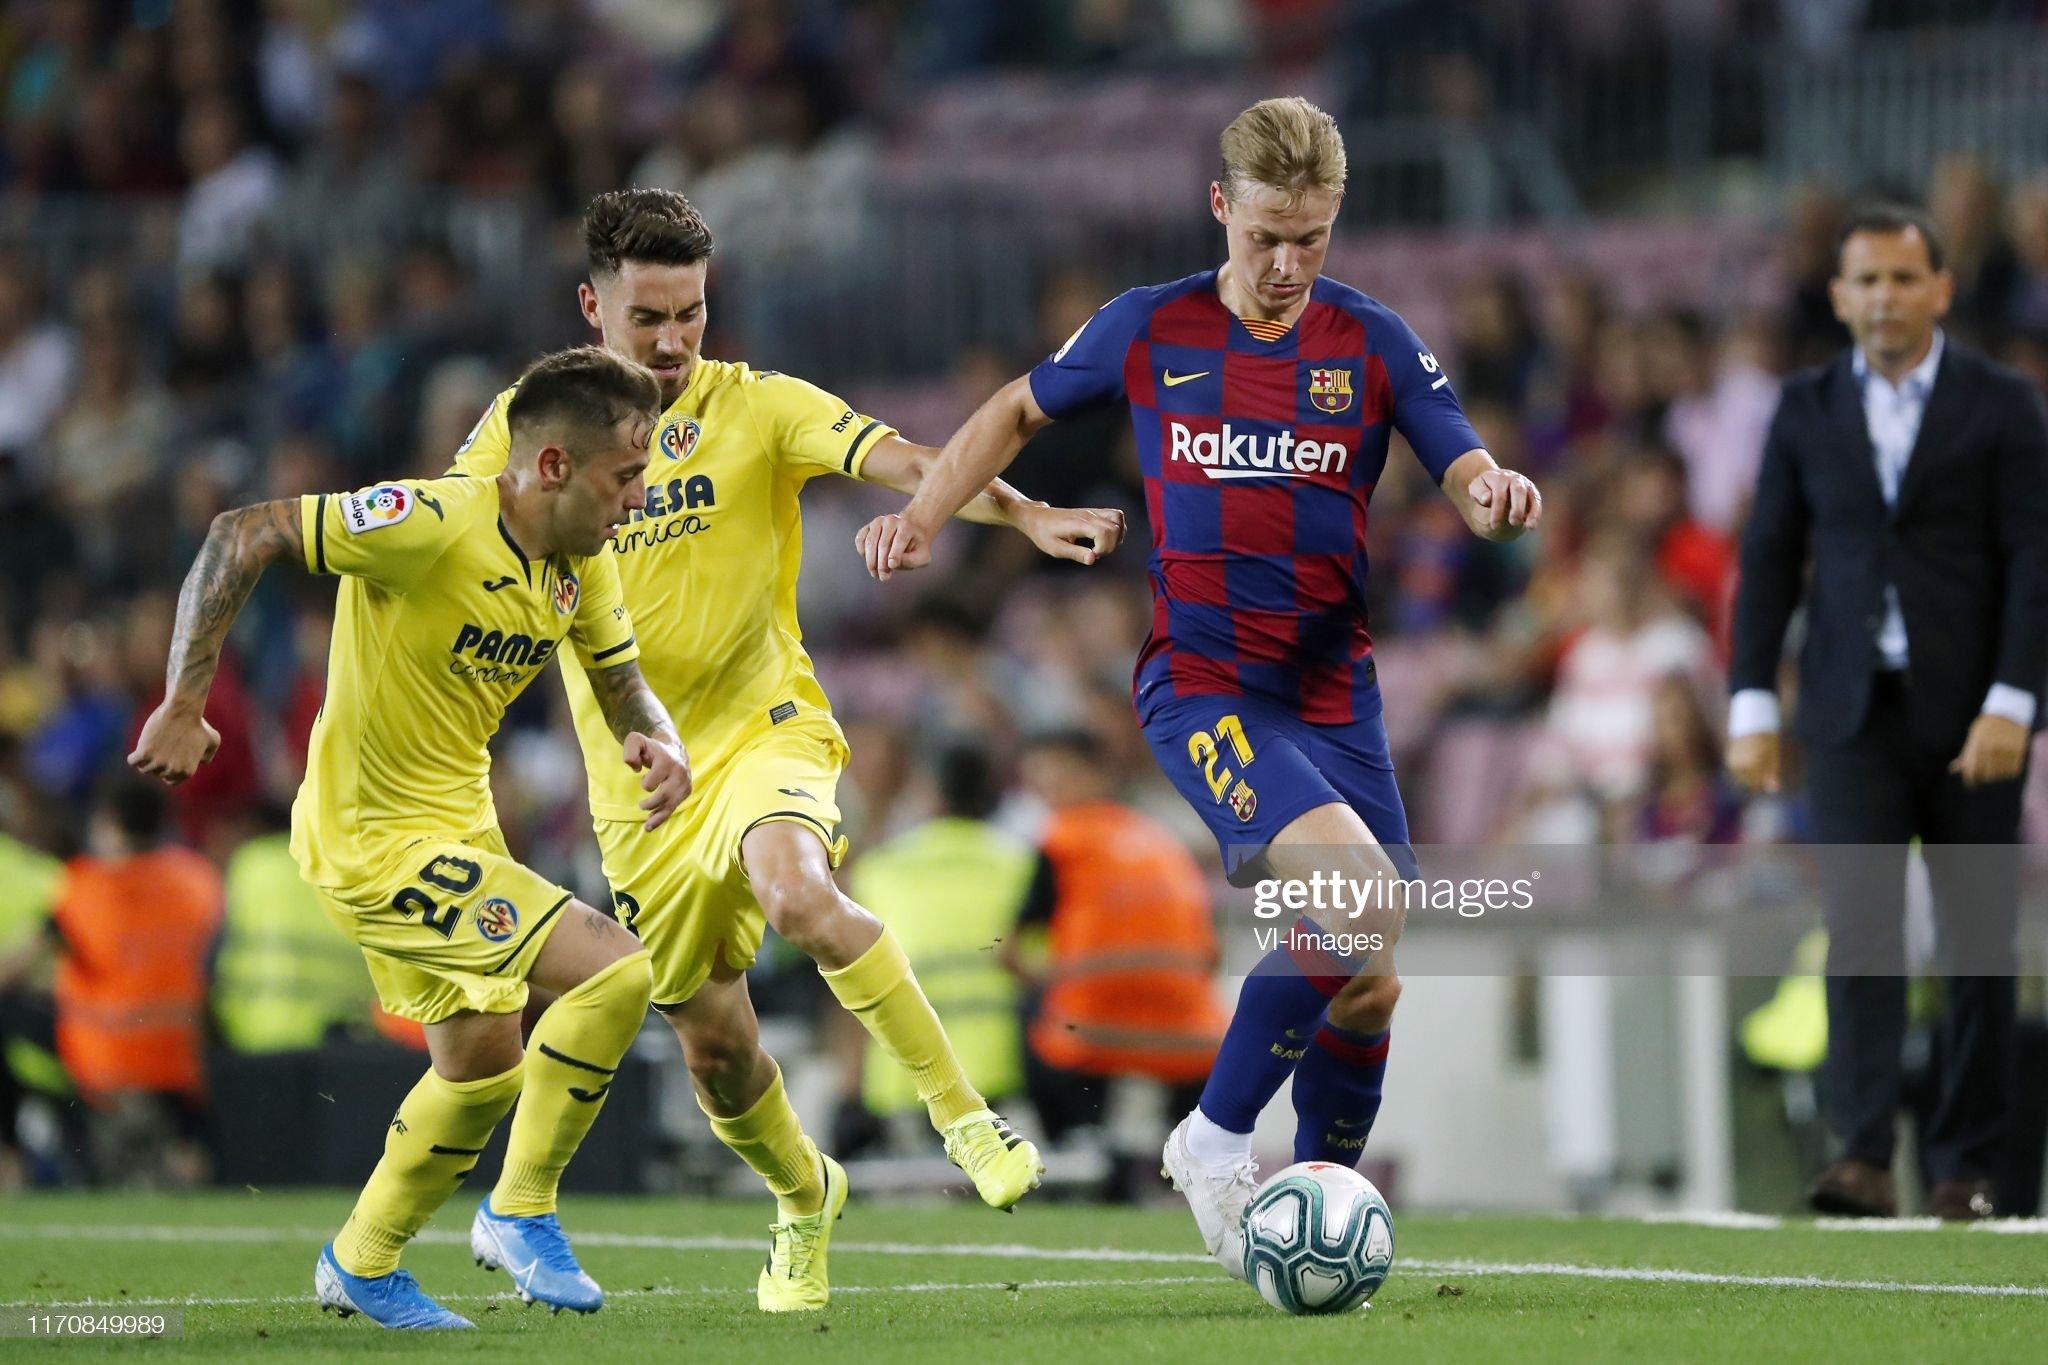 صور مباراة : برشلونة - فياريال 2-1 ( 24-09-2019 )  Ruben-pena-of-villarreal-cf-moi-gomez-of-villarreal-cf-frenkie-de-of-picture-id1170849989?s=2048x2048